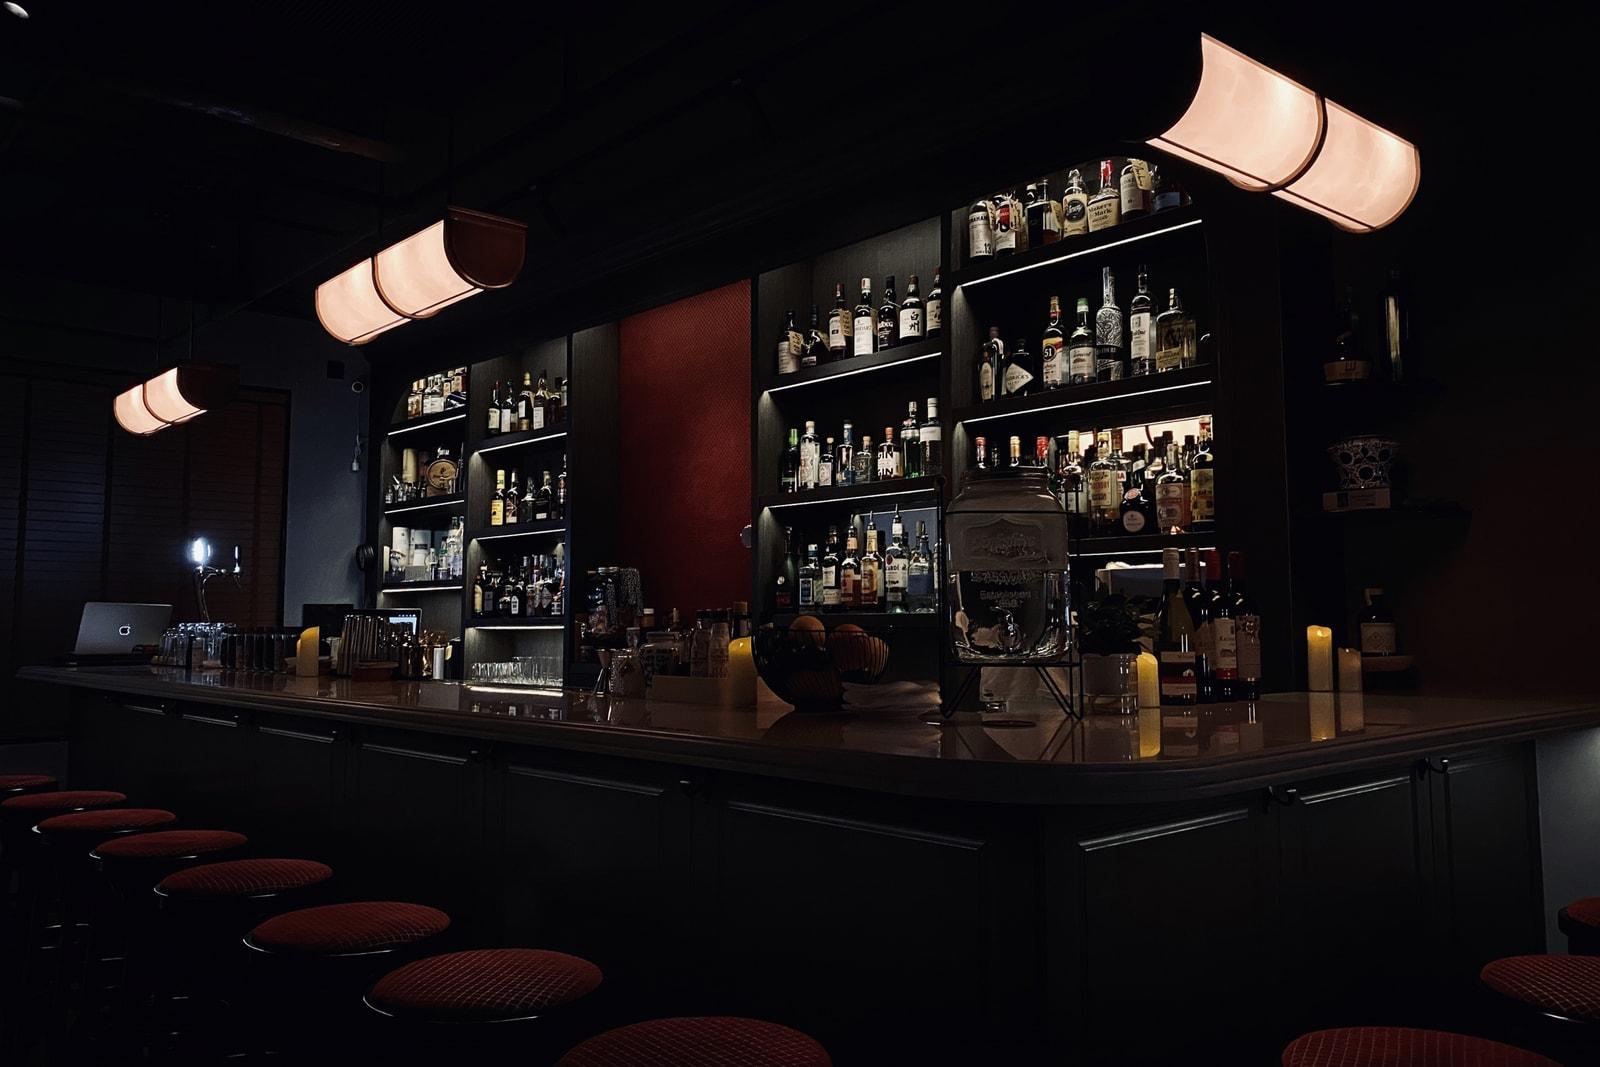 HYPEBEAST 邀請 3 位專業調酒師推介 7 家上海私藏酒吧